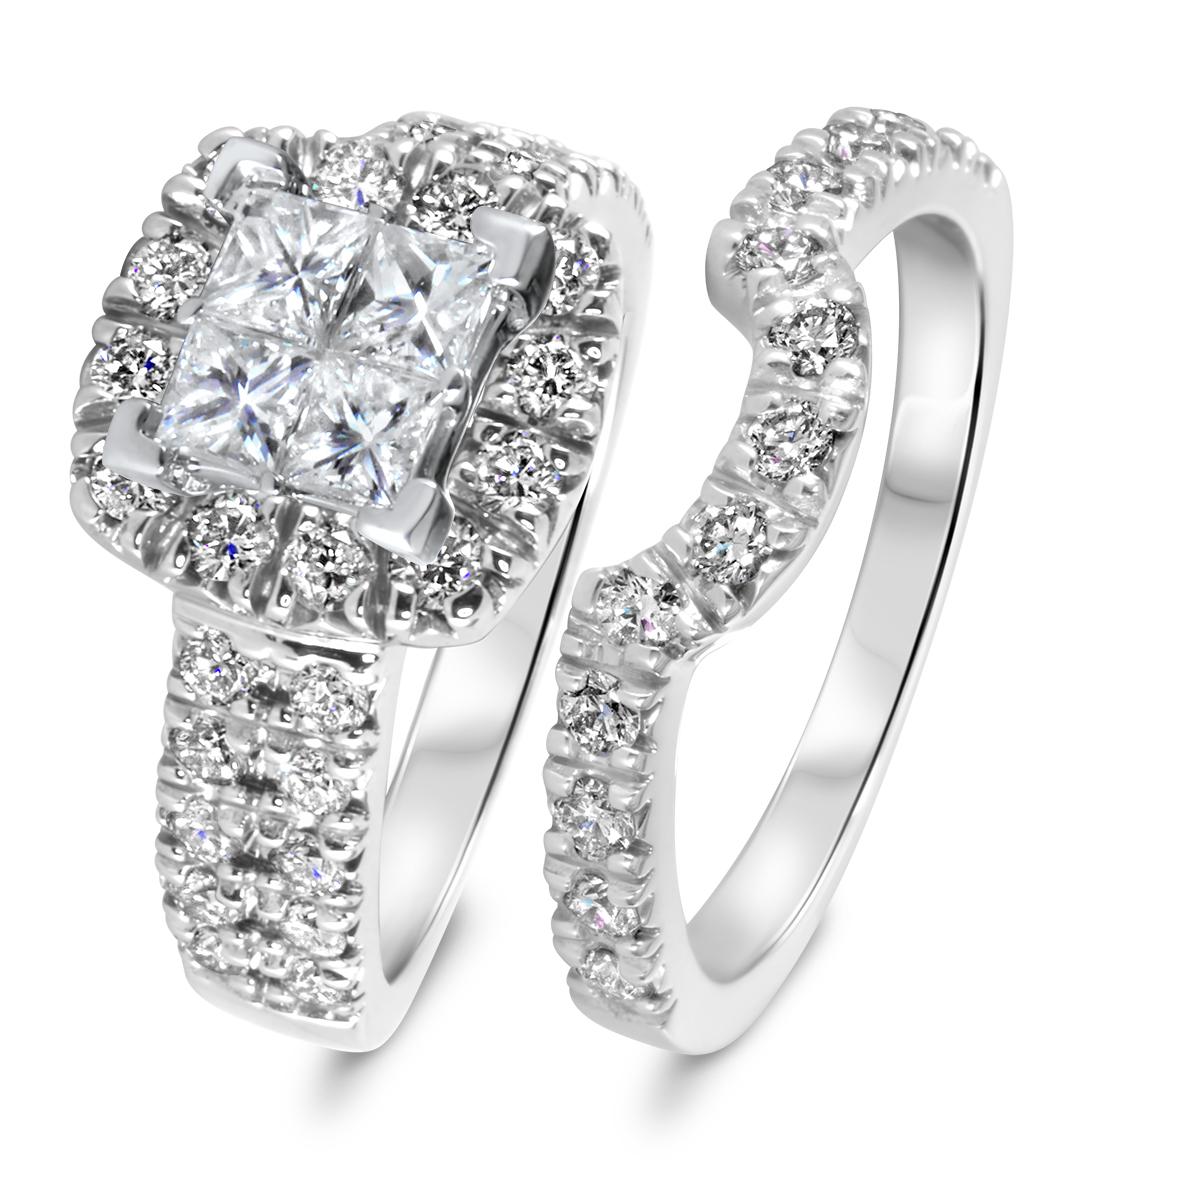 2 CT. T.W. Diamond Women's Bridal Wedding Ring Set 10K White Gold